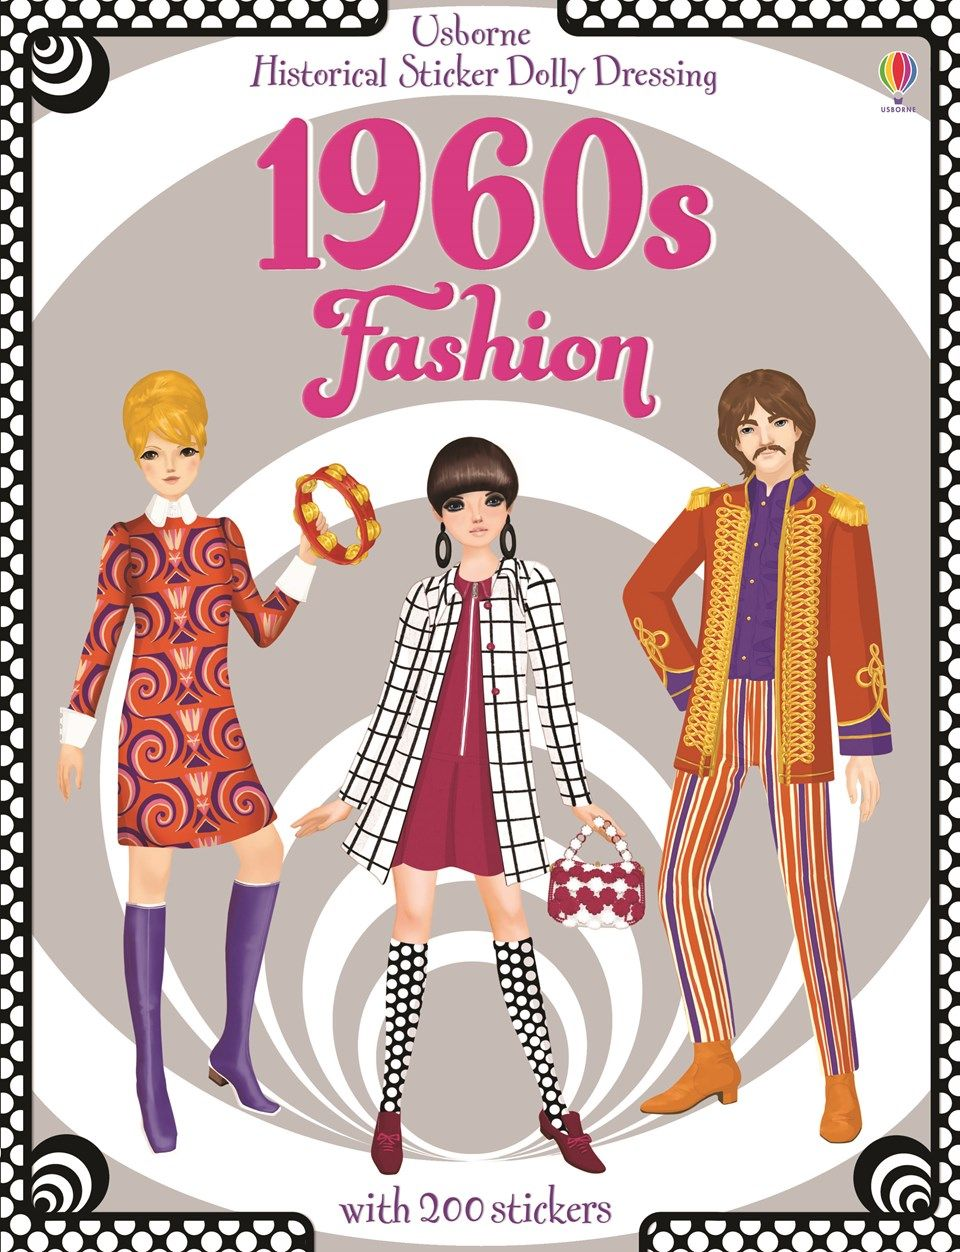 Usborne Books At Home Fashion Coloring Book Coloring Book Clothes Colorful Fashion